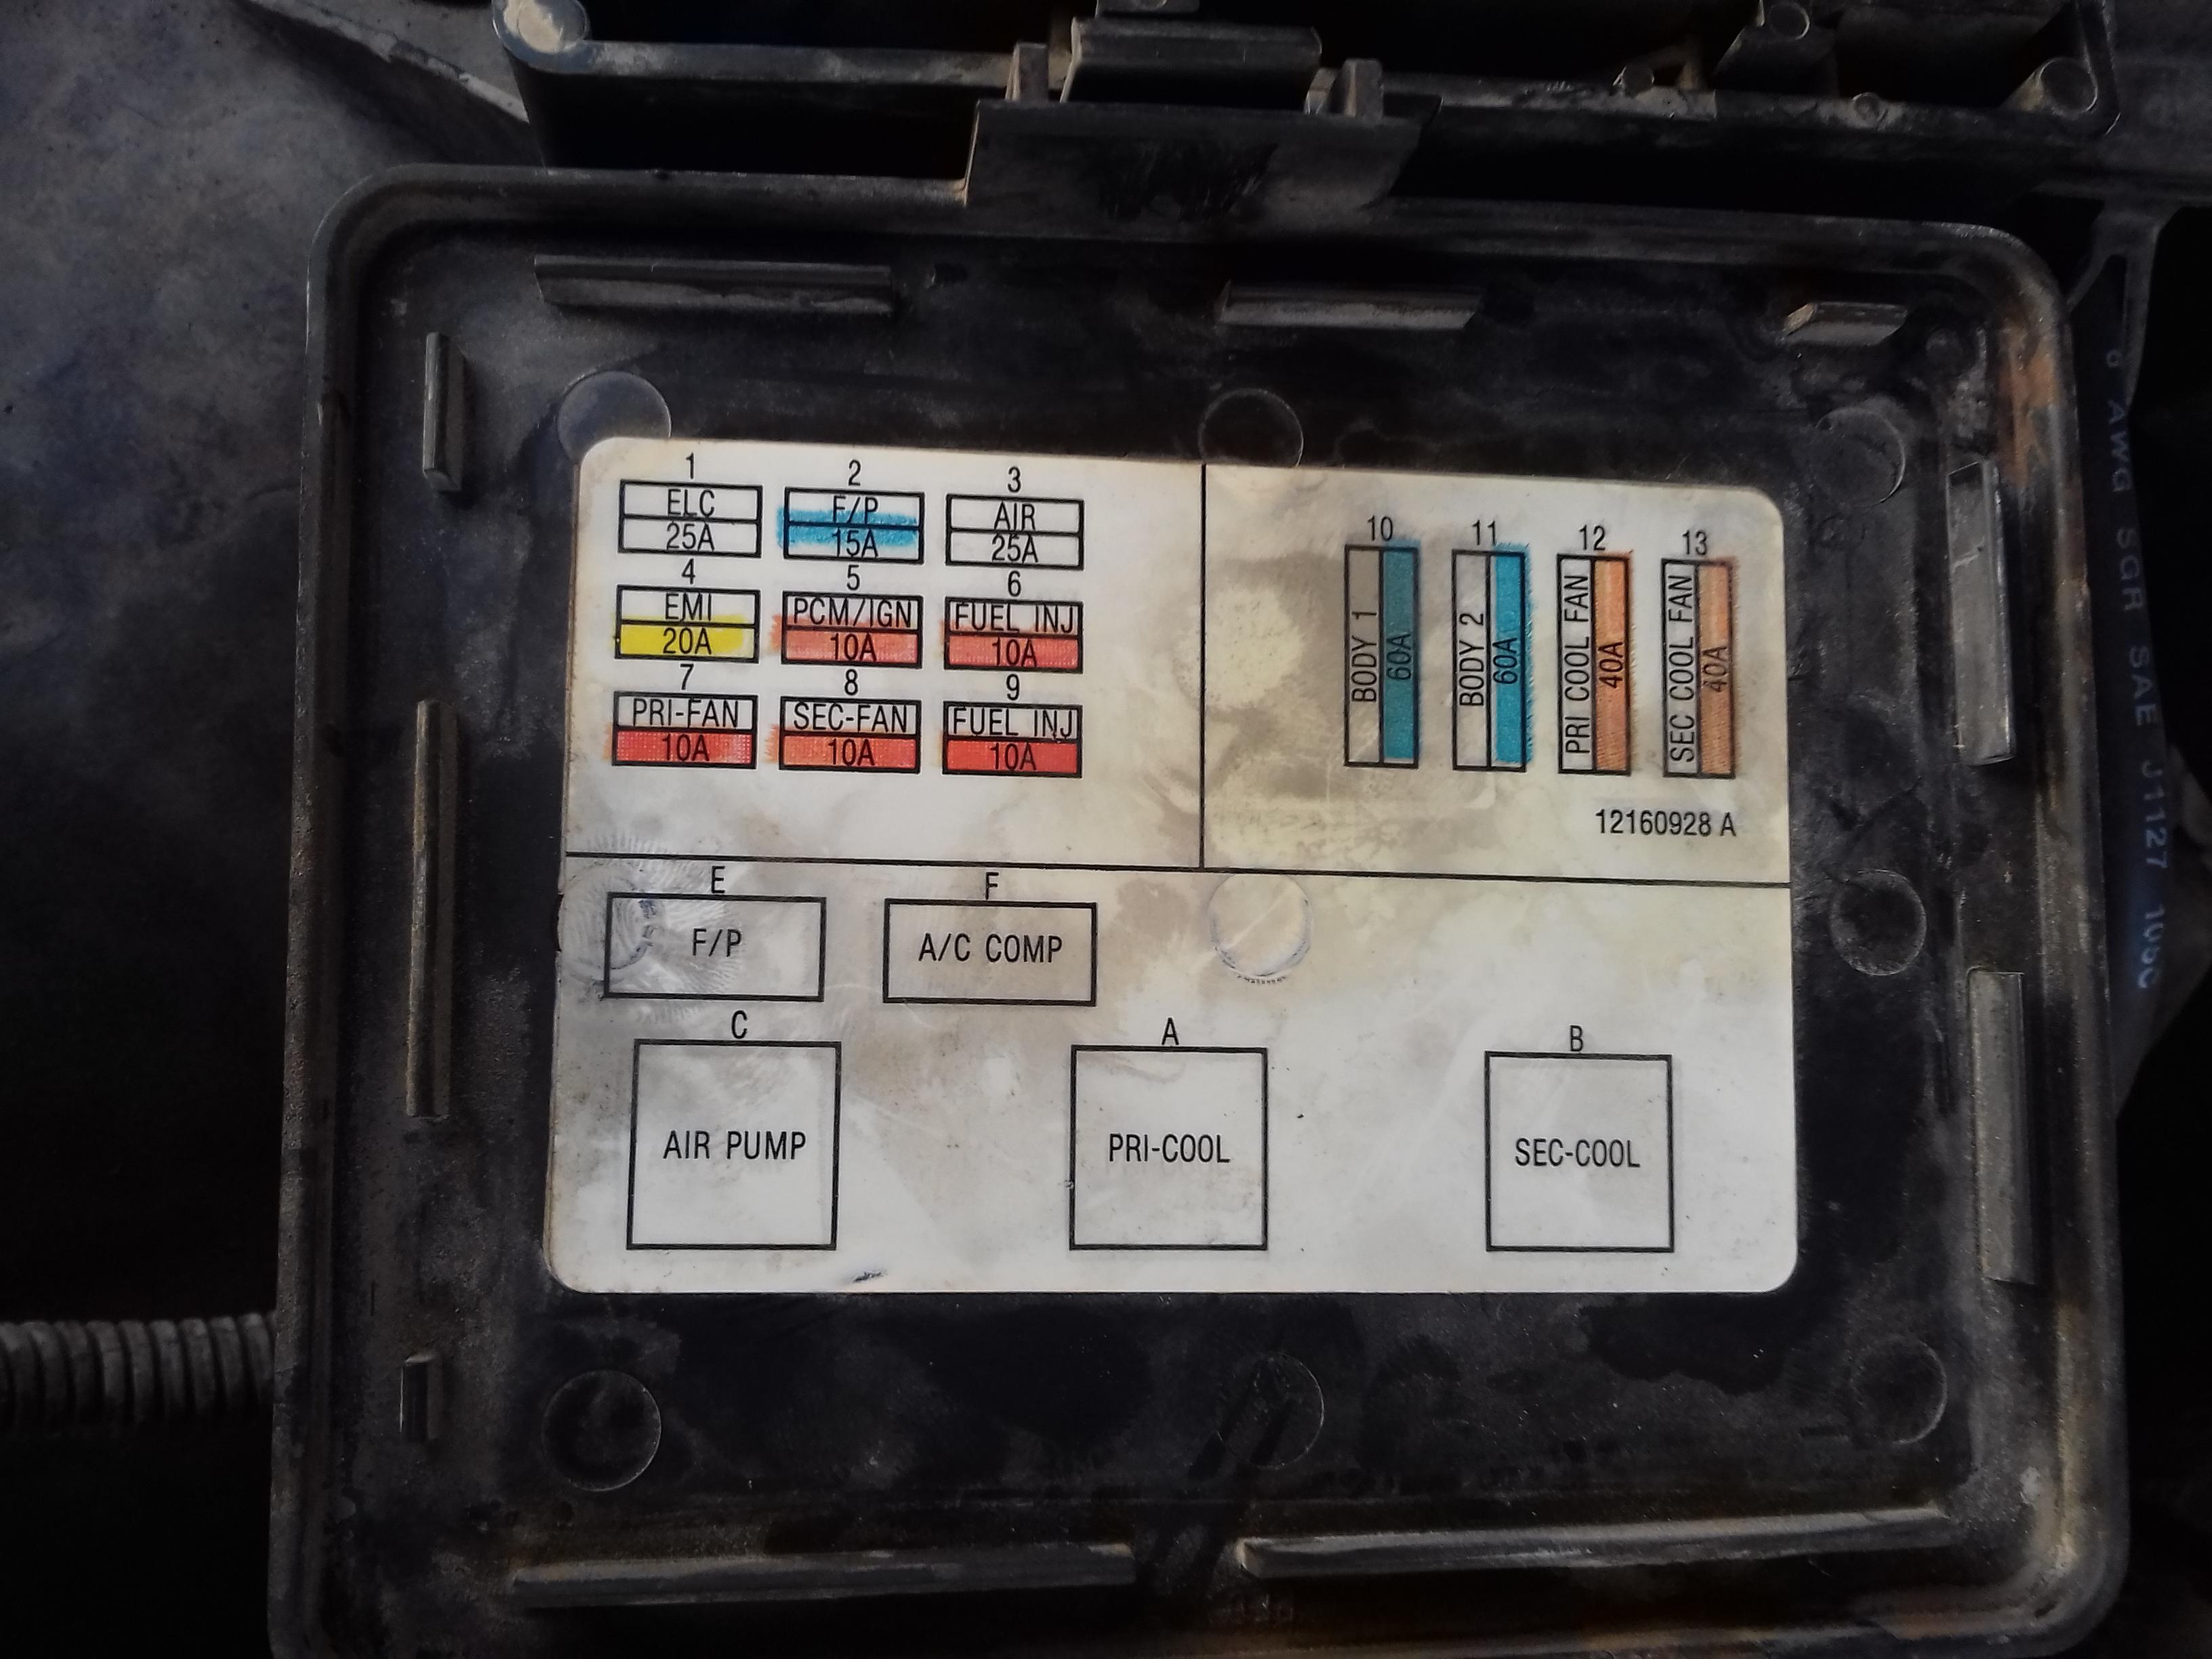 [SCHEMATICS_48DE]  95 Impala Ss Fuse Box - 2008 Camry Radio Wiring for Wiring Diagram  Schematics | 96 Impala Fuse Box |  | Wiring Diagram Schematics